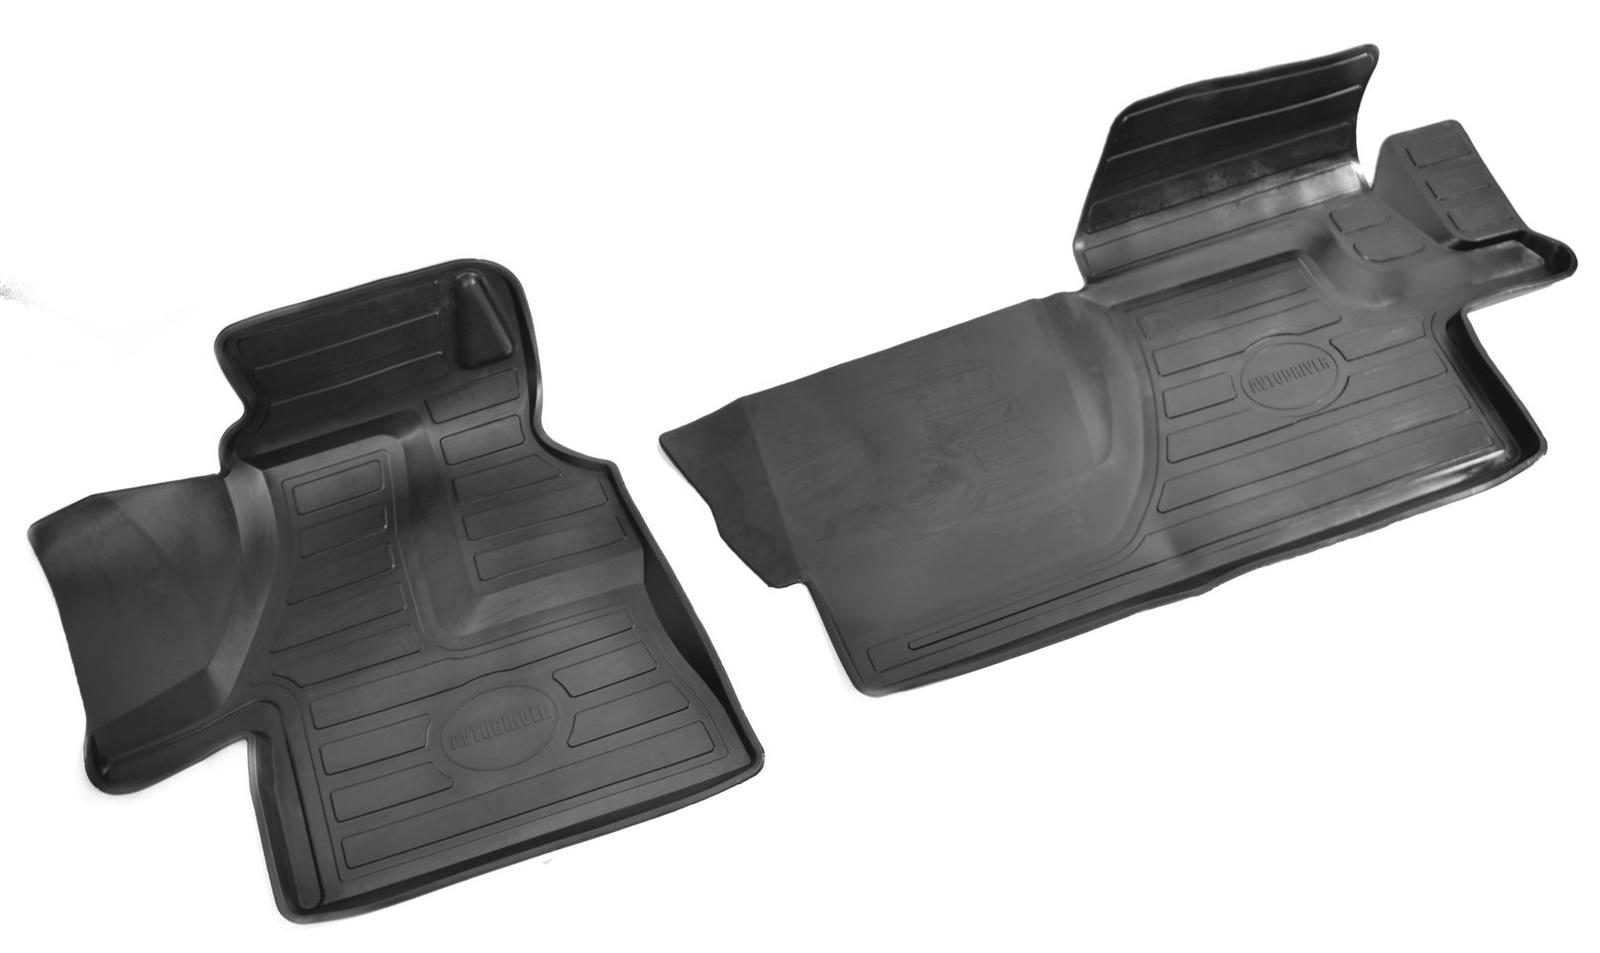 Коврики салона Avtodriver для Mercedes-Benz Sprinter Classic (2013-) (2 передних) ADRAVG167, резиновые, с бортиком, черный коврики салона avtodriver для mercedes benz e klasse w212 2007 adravg155 резиновые с бортиком черный